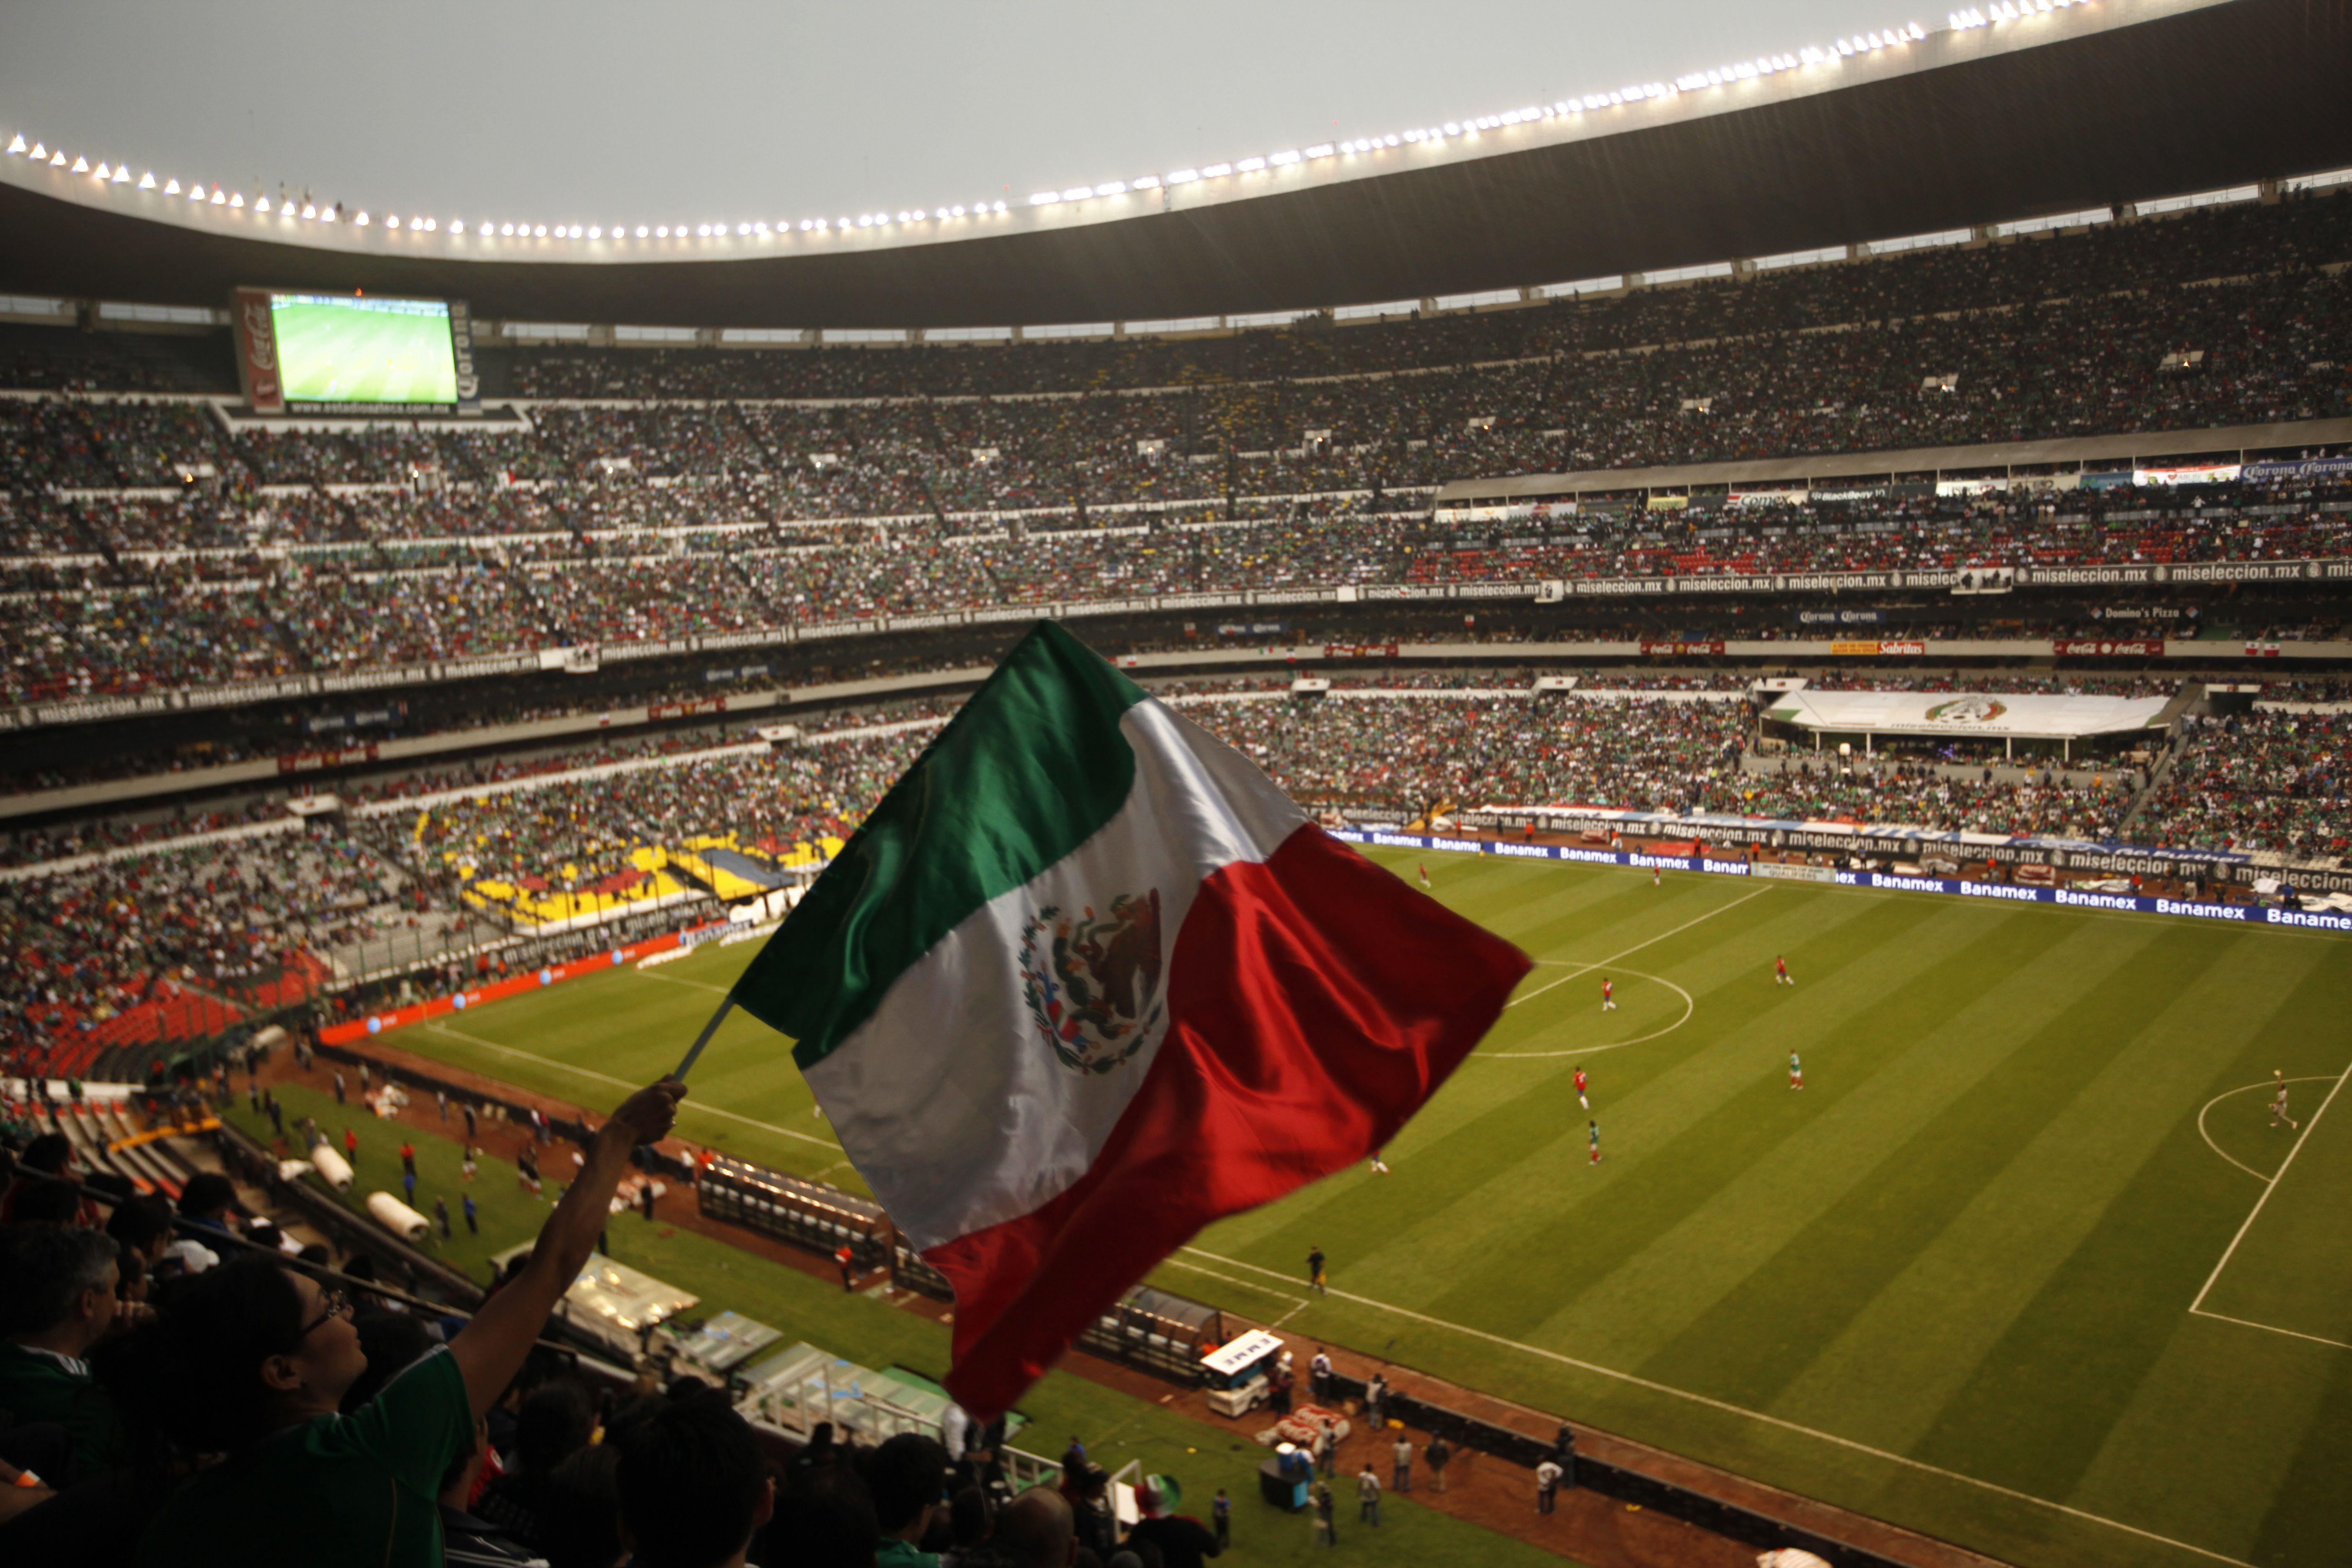 Estadio Azteca Google Search Soccer Stadium Stadium Football Stadiums